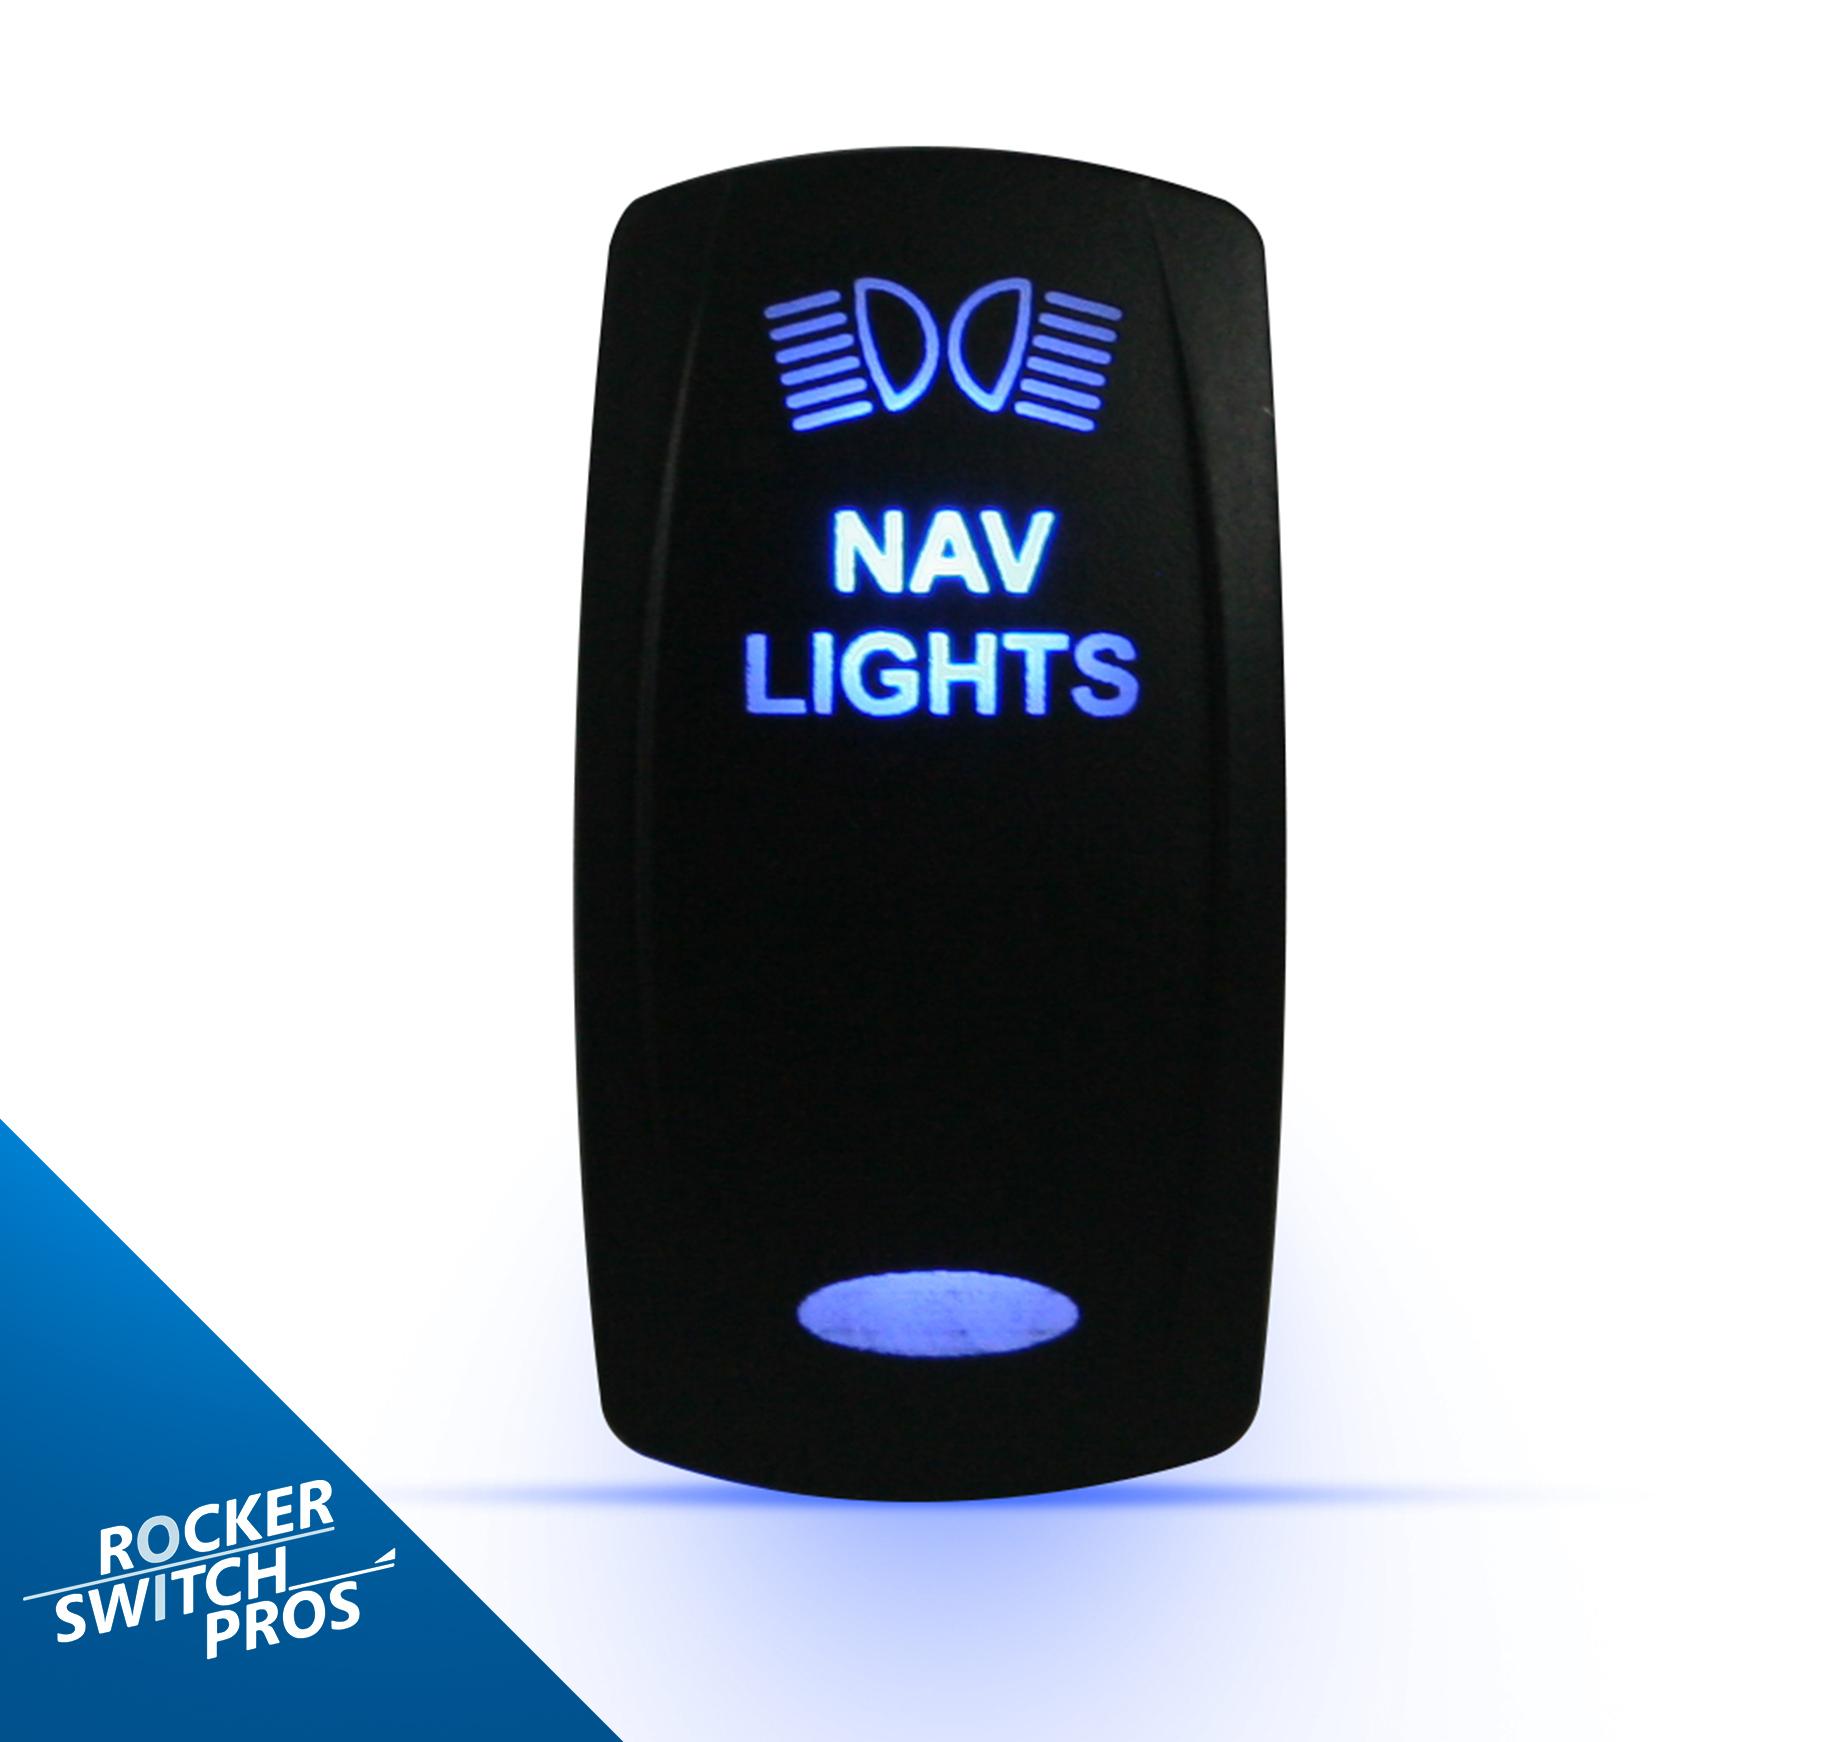 illuminated marine rocker switches cbr 600 f4 wiring diagram switch pros custom cover actuator gallery